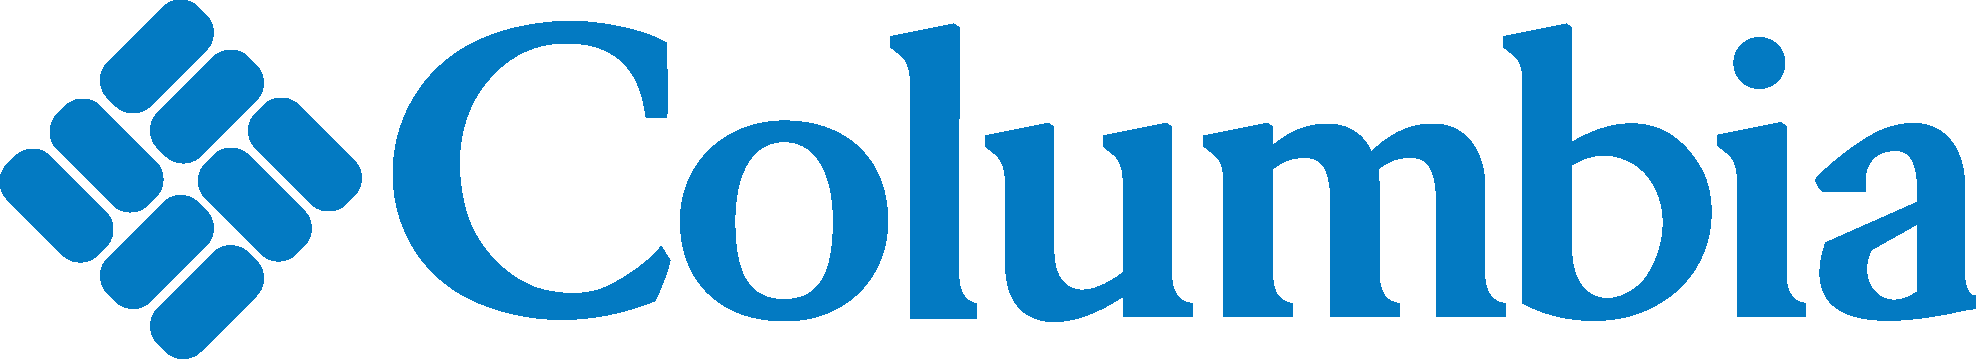 columbia_sportswear-logo.png